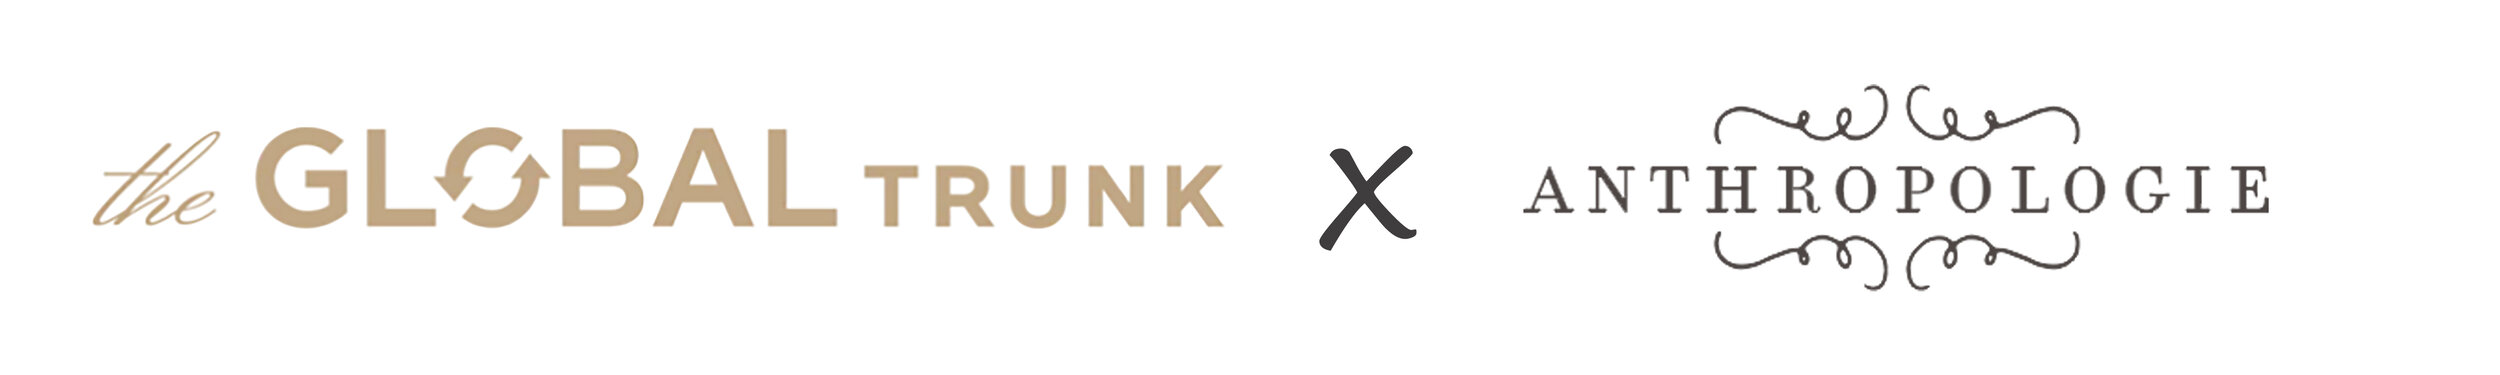 global trunk x anthropologie.jpg